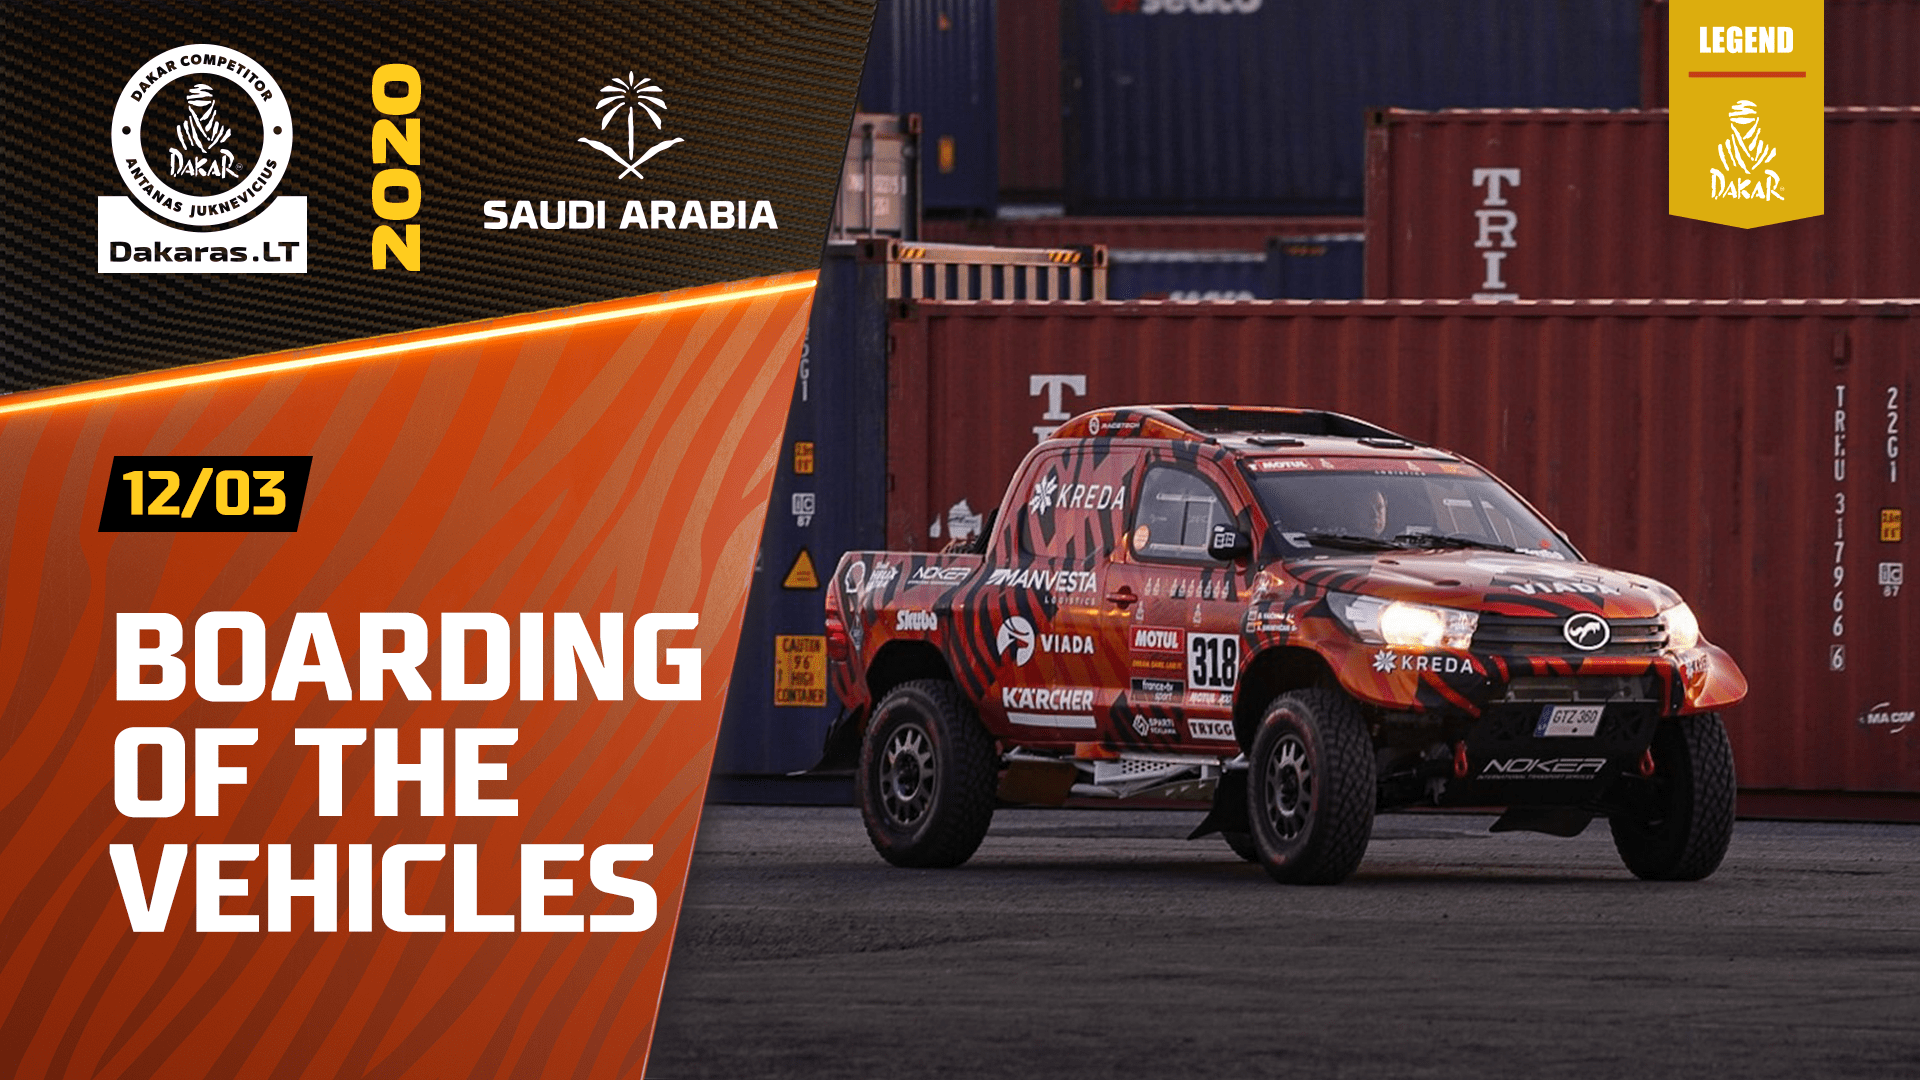 Dakar Rally 2020. Scrutineering and Vehicle Boarding in Marseille